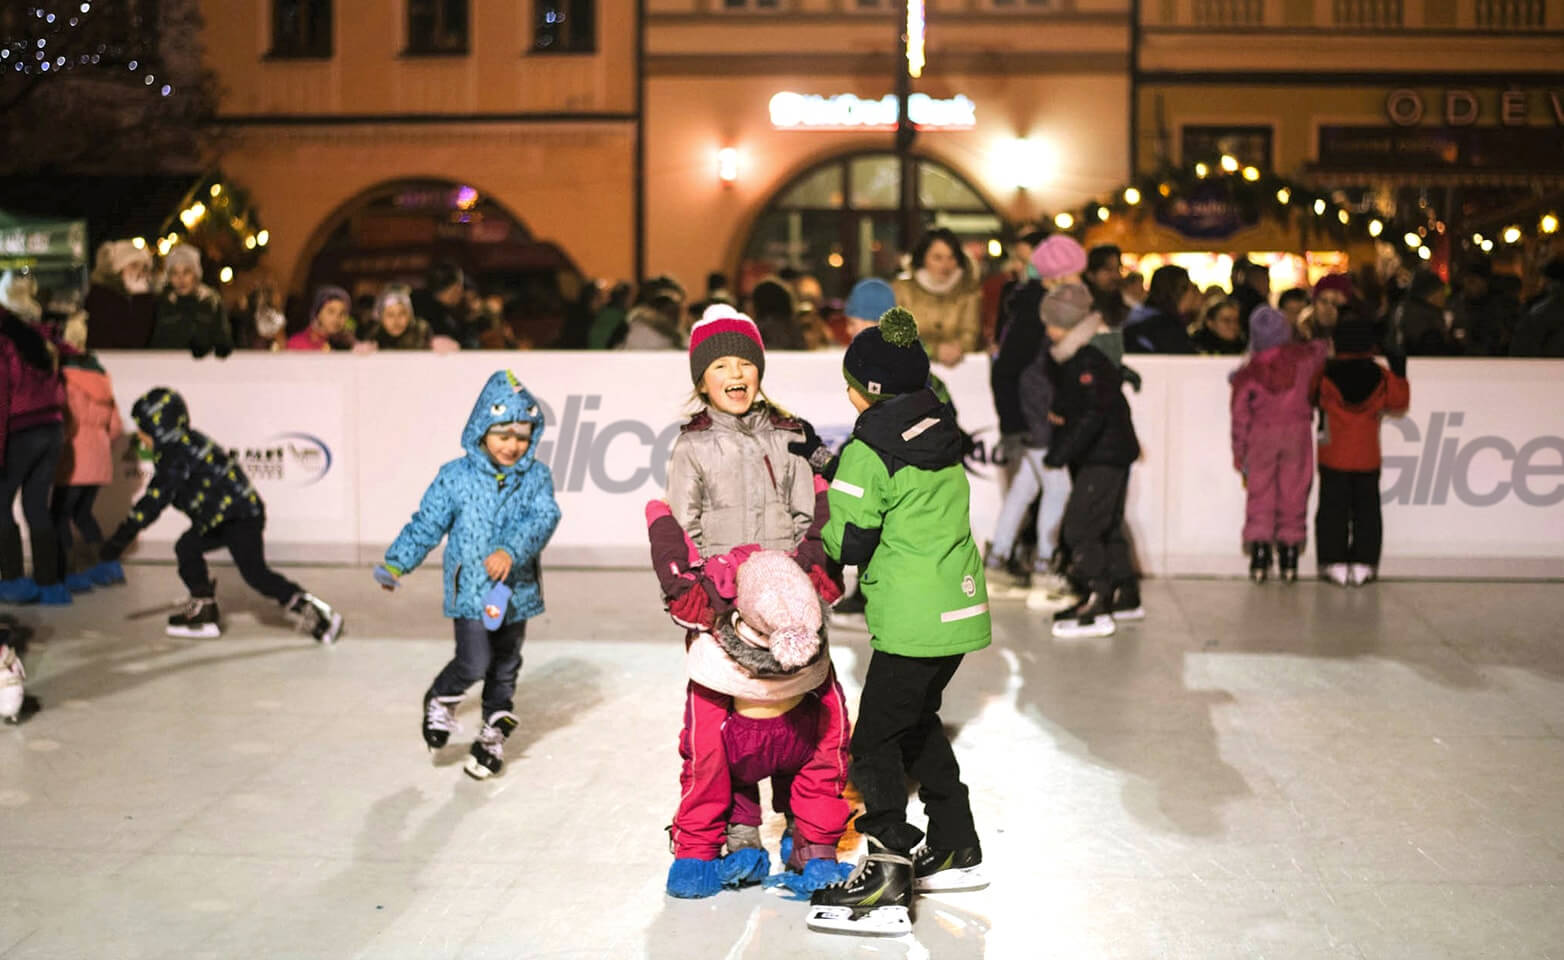 Children enjoying artificial ice rink for Christmas